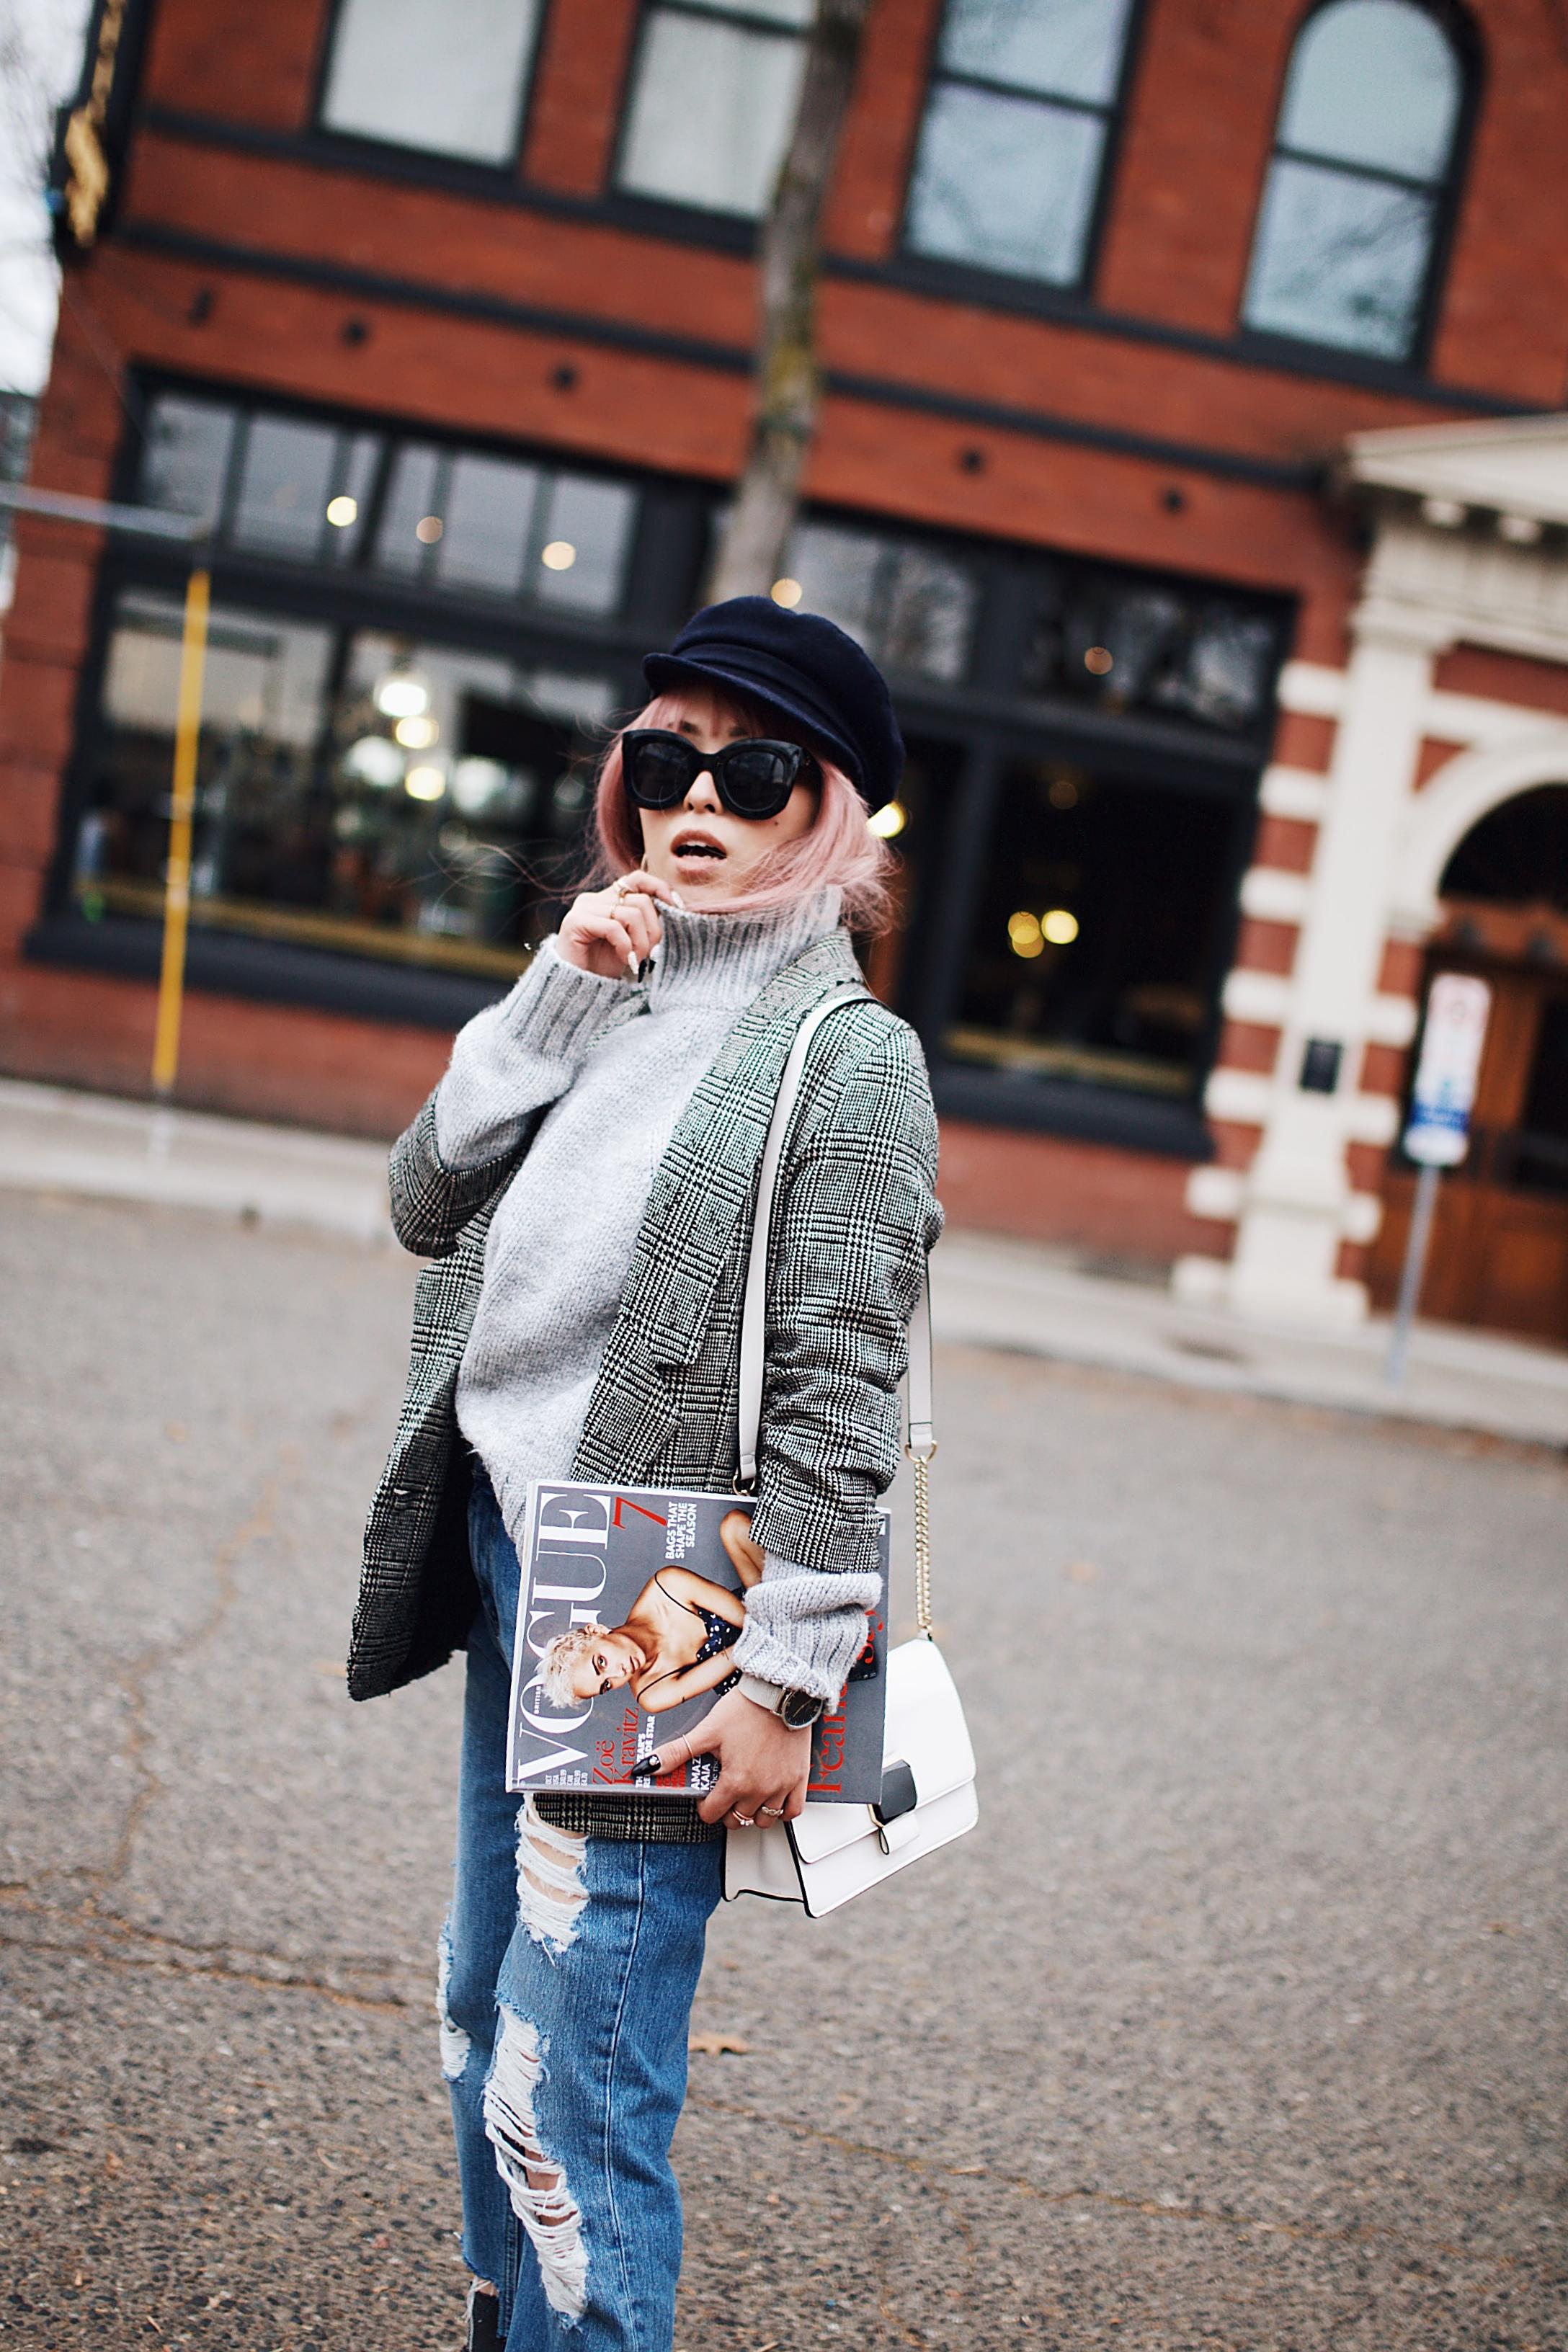 Zara Gray Turtleneck Sweater-Nordstrom Checked Blazer-ASOS Distressed frayed hem jeans-NAIGAI Glitter Ankle Socks-Black scrappy sandals-H&M White Crossbody Bag-Aritzia Fisherman Hat-Aika's Love Closet-Seattle fashion style blogger-pink hair-Japanese 4